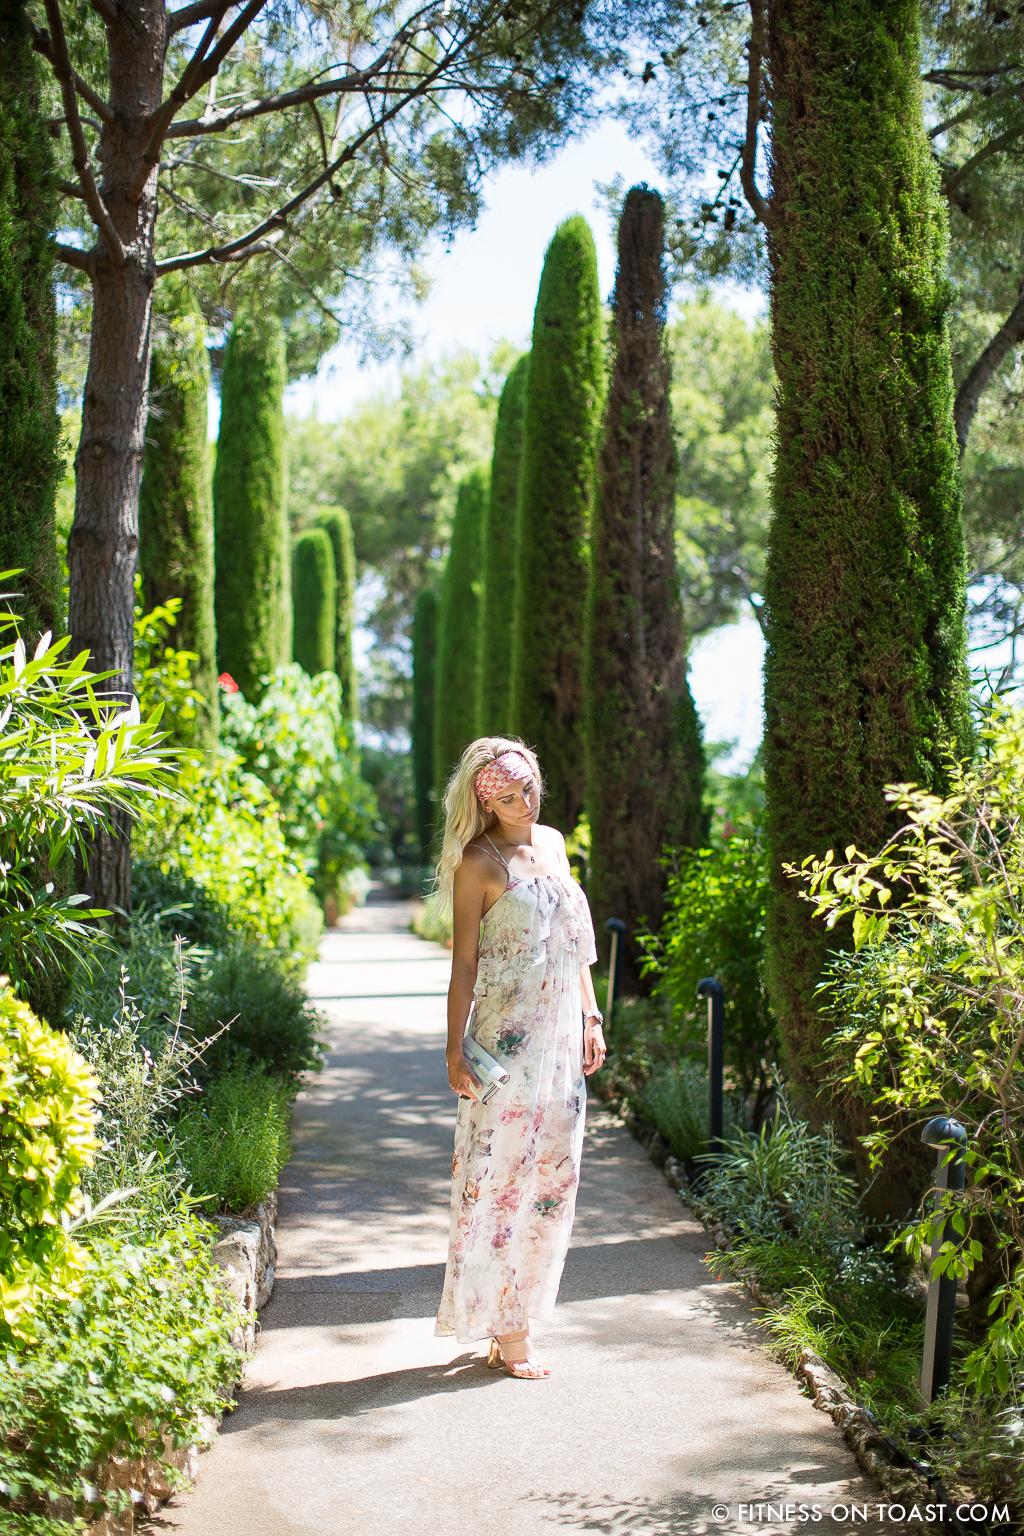 Fitness On Toast Faya Blog Benefits Of Walking Healthy Walk Grand Hotel Du Cap Ferrat Cote D'Azur Azur South Of France Exercise Calorie Burn Girl Fashion-4